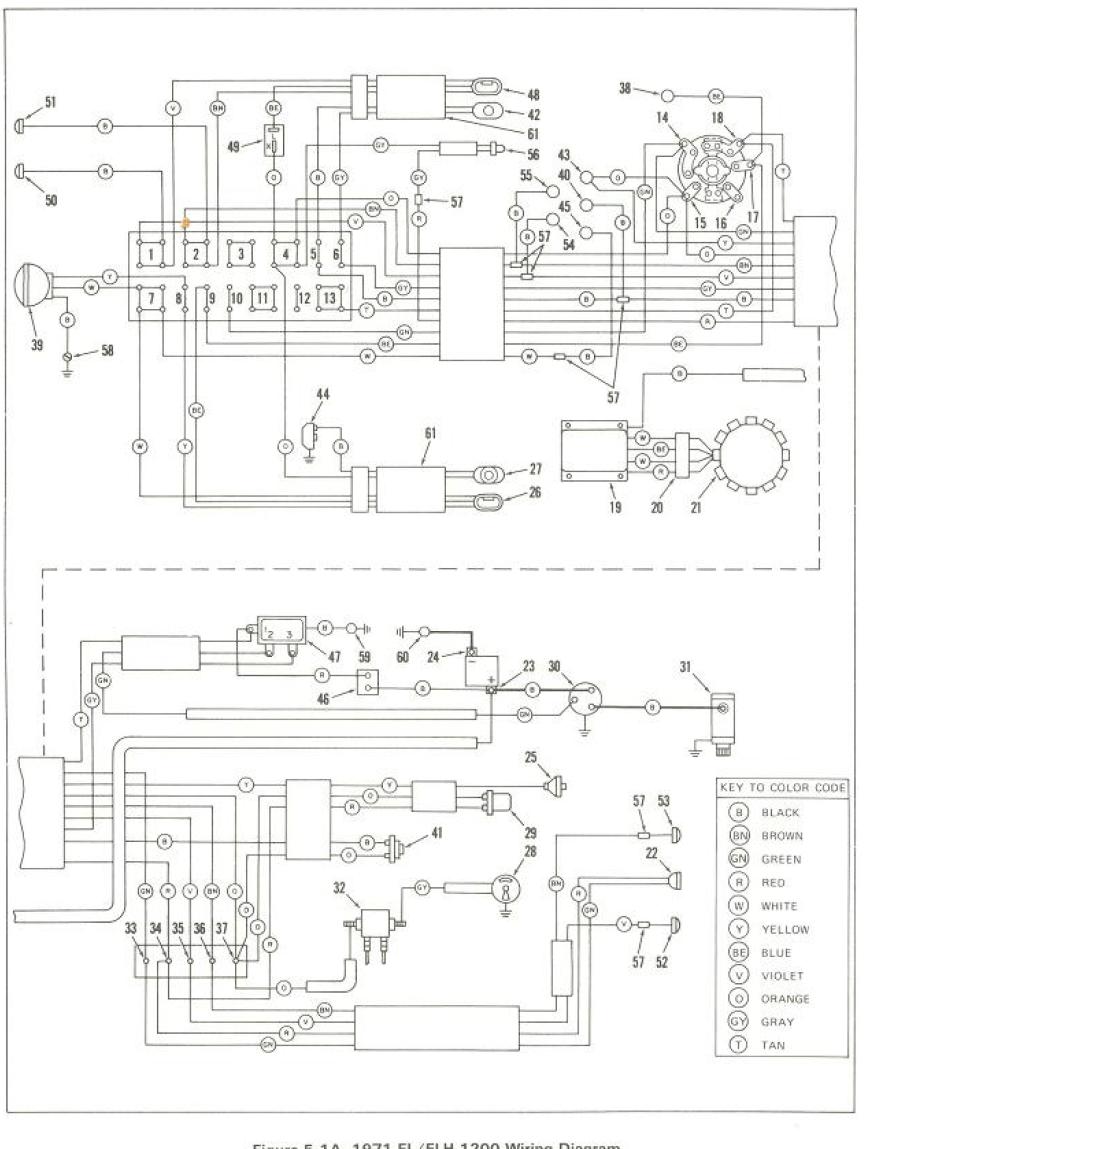 Harley Davidson Sportster 1000 Wiring Diagram - Diagrams ... on